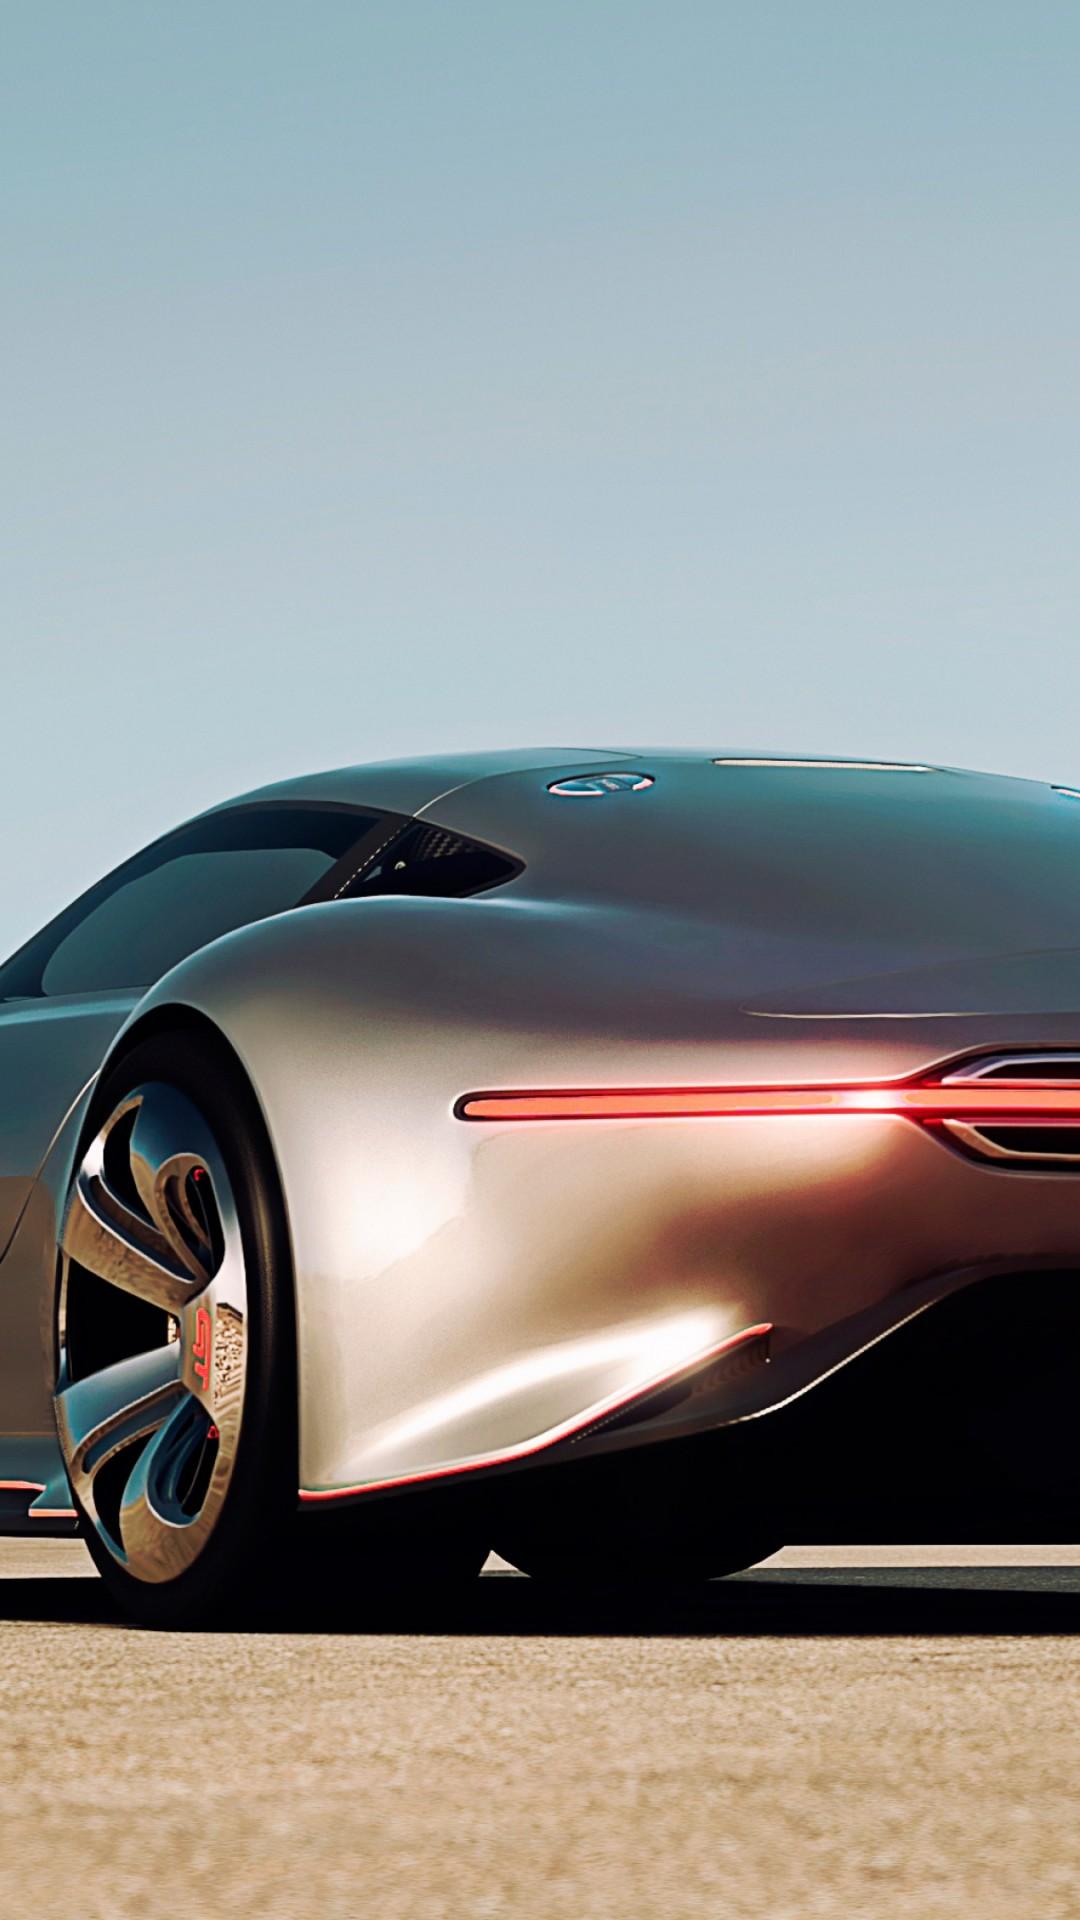 Lamborghini For Rent >> Wallpaper Mercedes-Benz AMG Vision, supercar, Gran Turismo, concept, Mercedes, 2015 car, silver ...